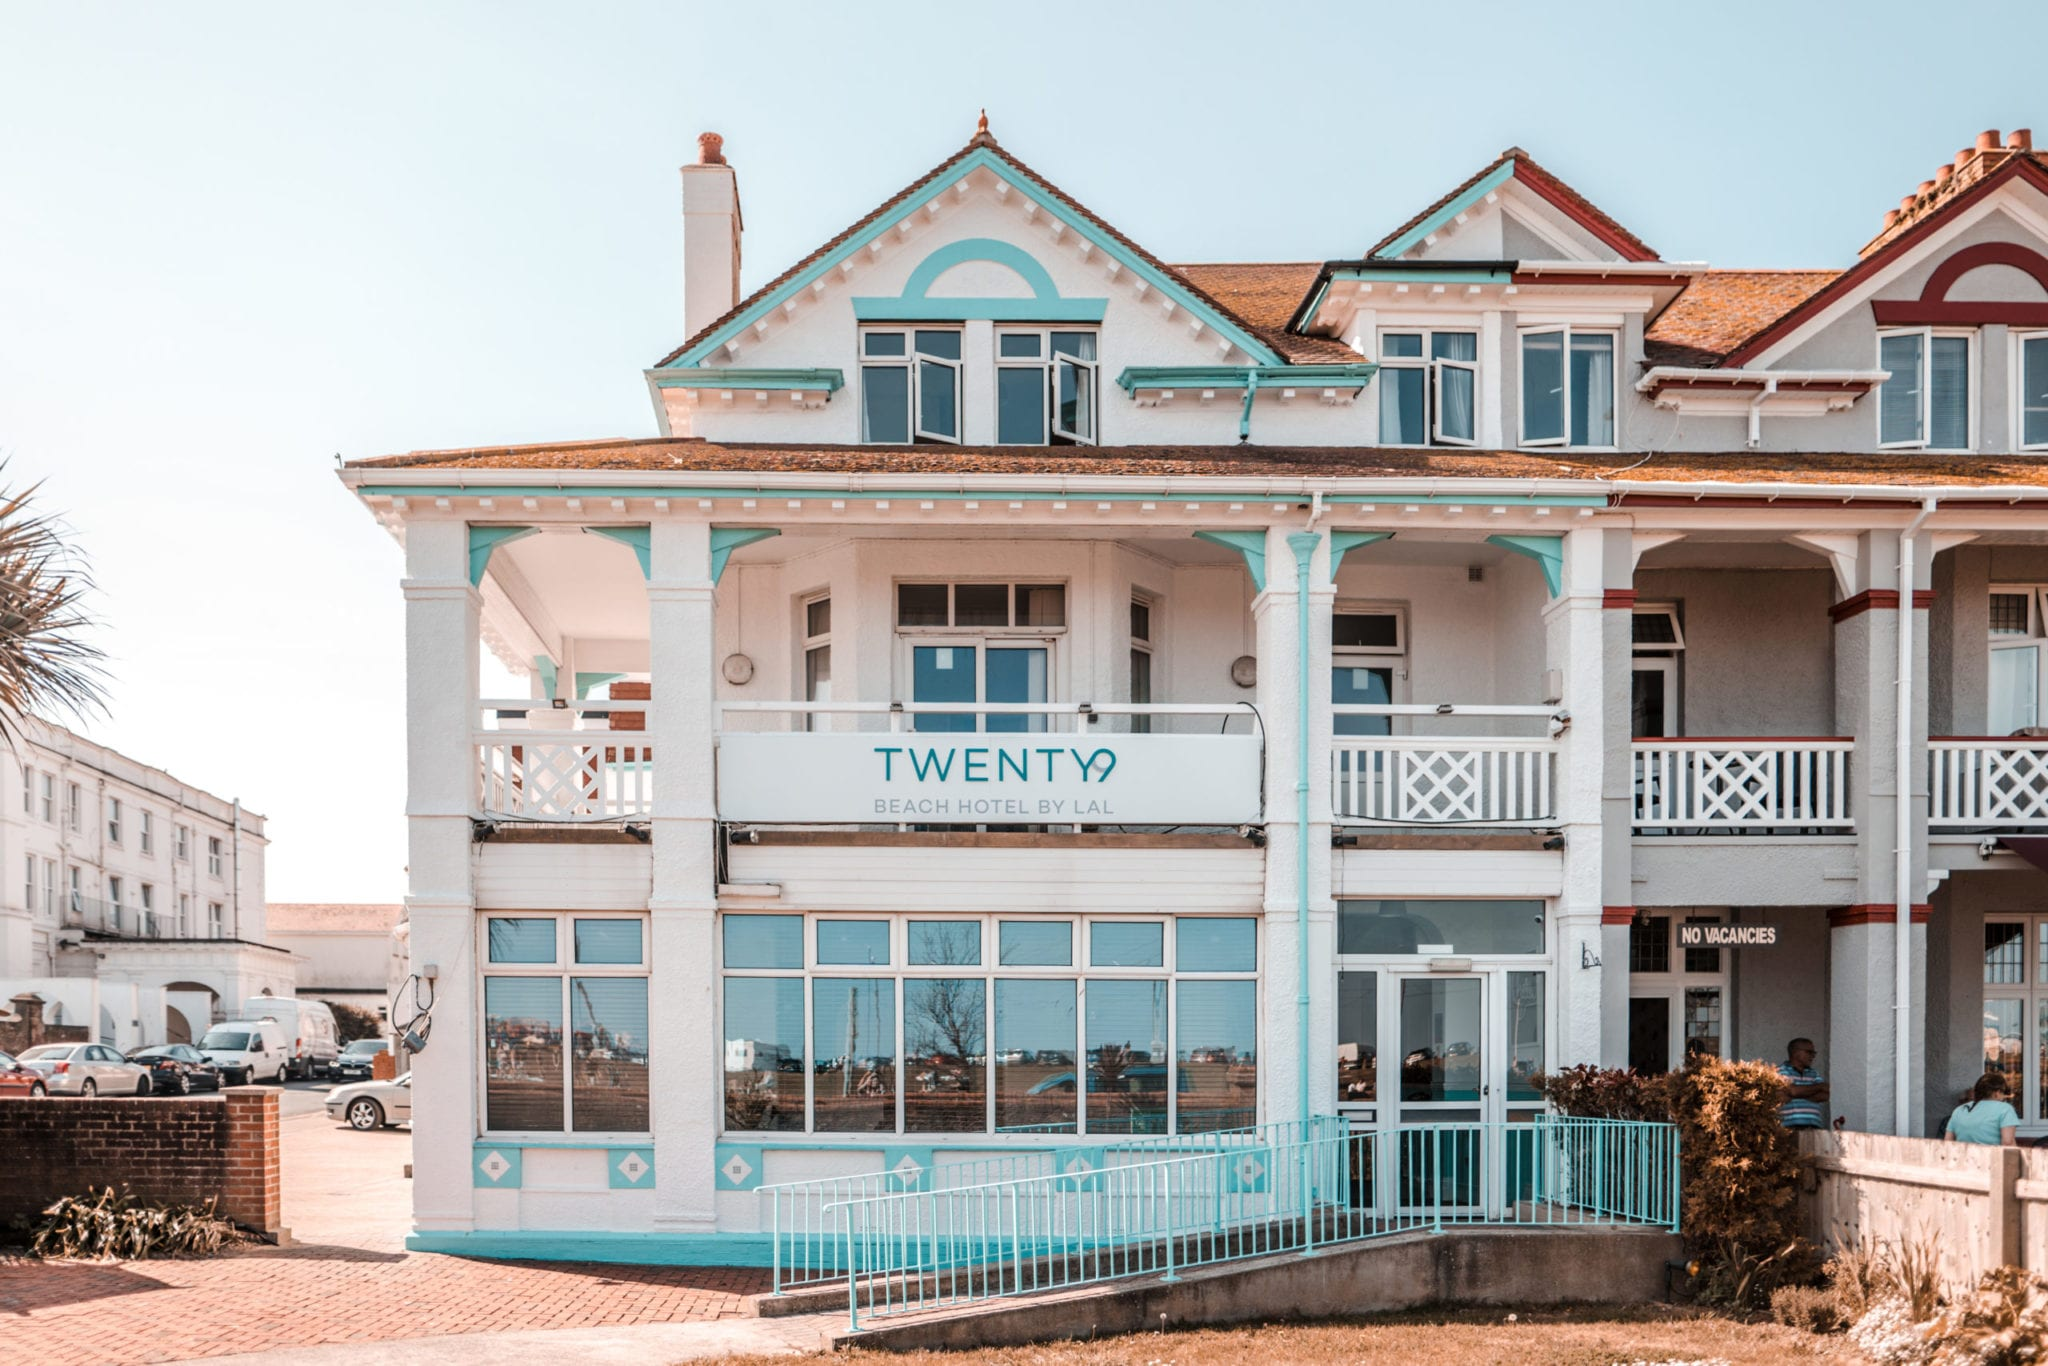 Twenty9 Hotel in Torbay